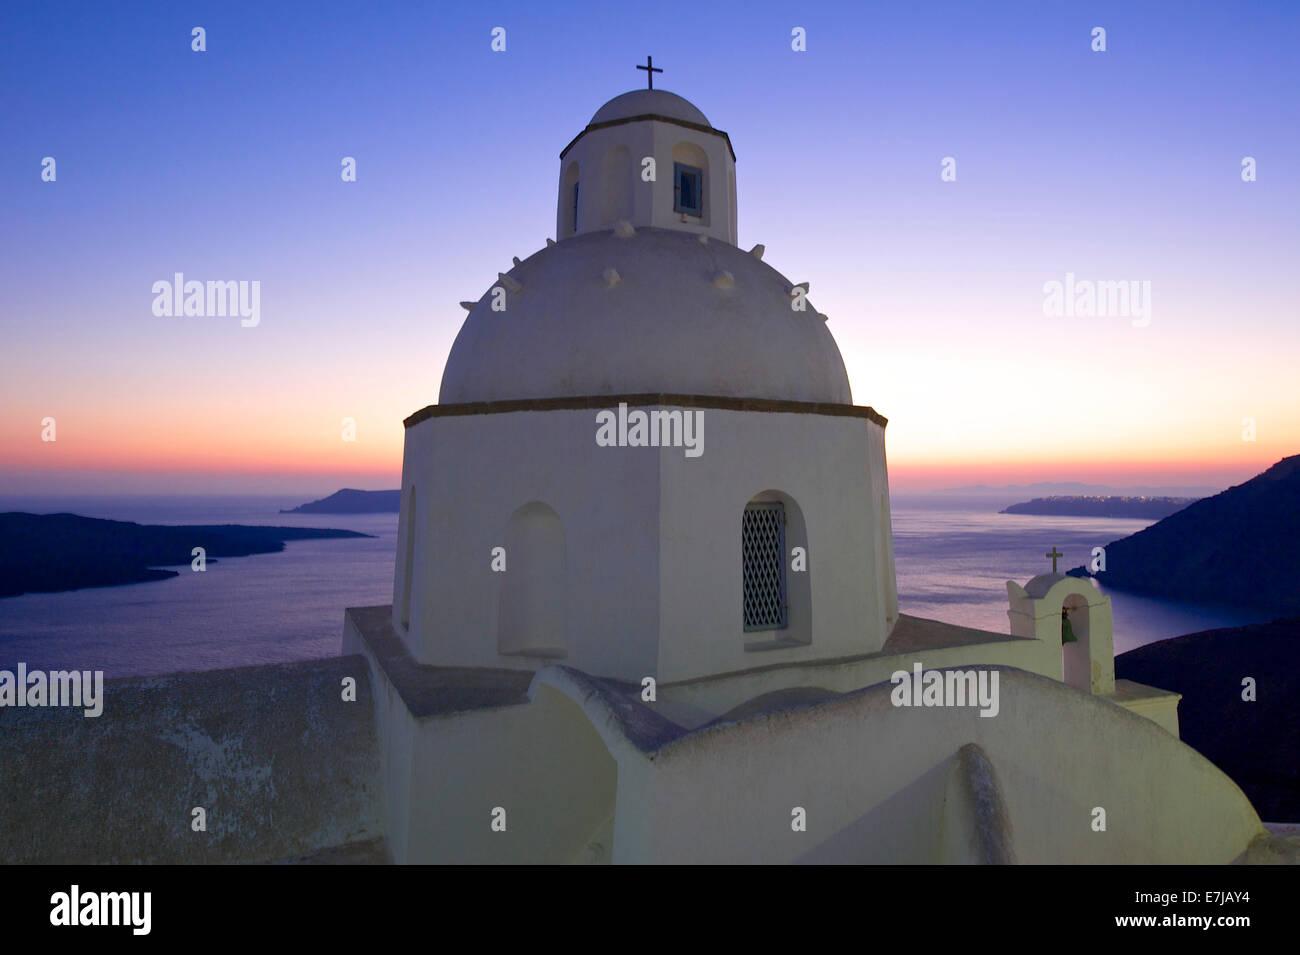 L'église Agios Minas au coucher du soleil, Thira, Santorin, Cyclades, Grèce Photo Stock